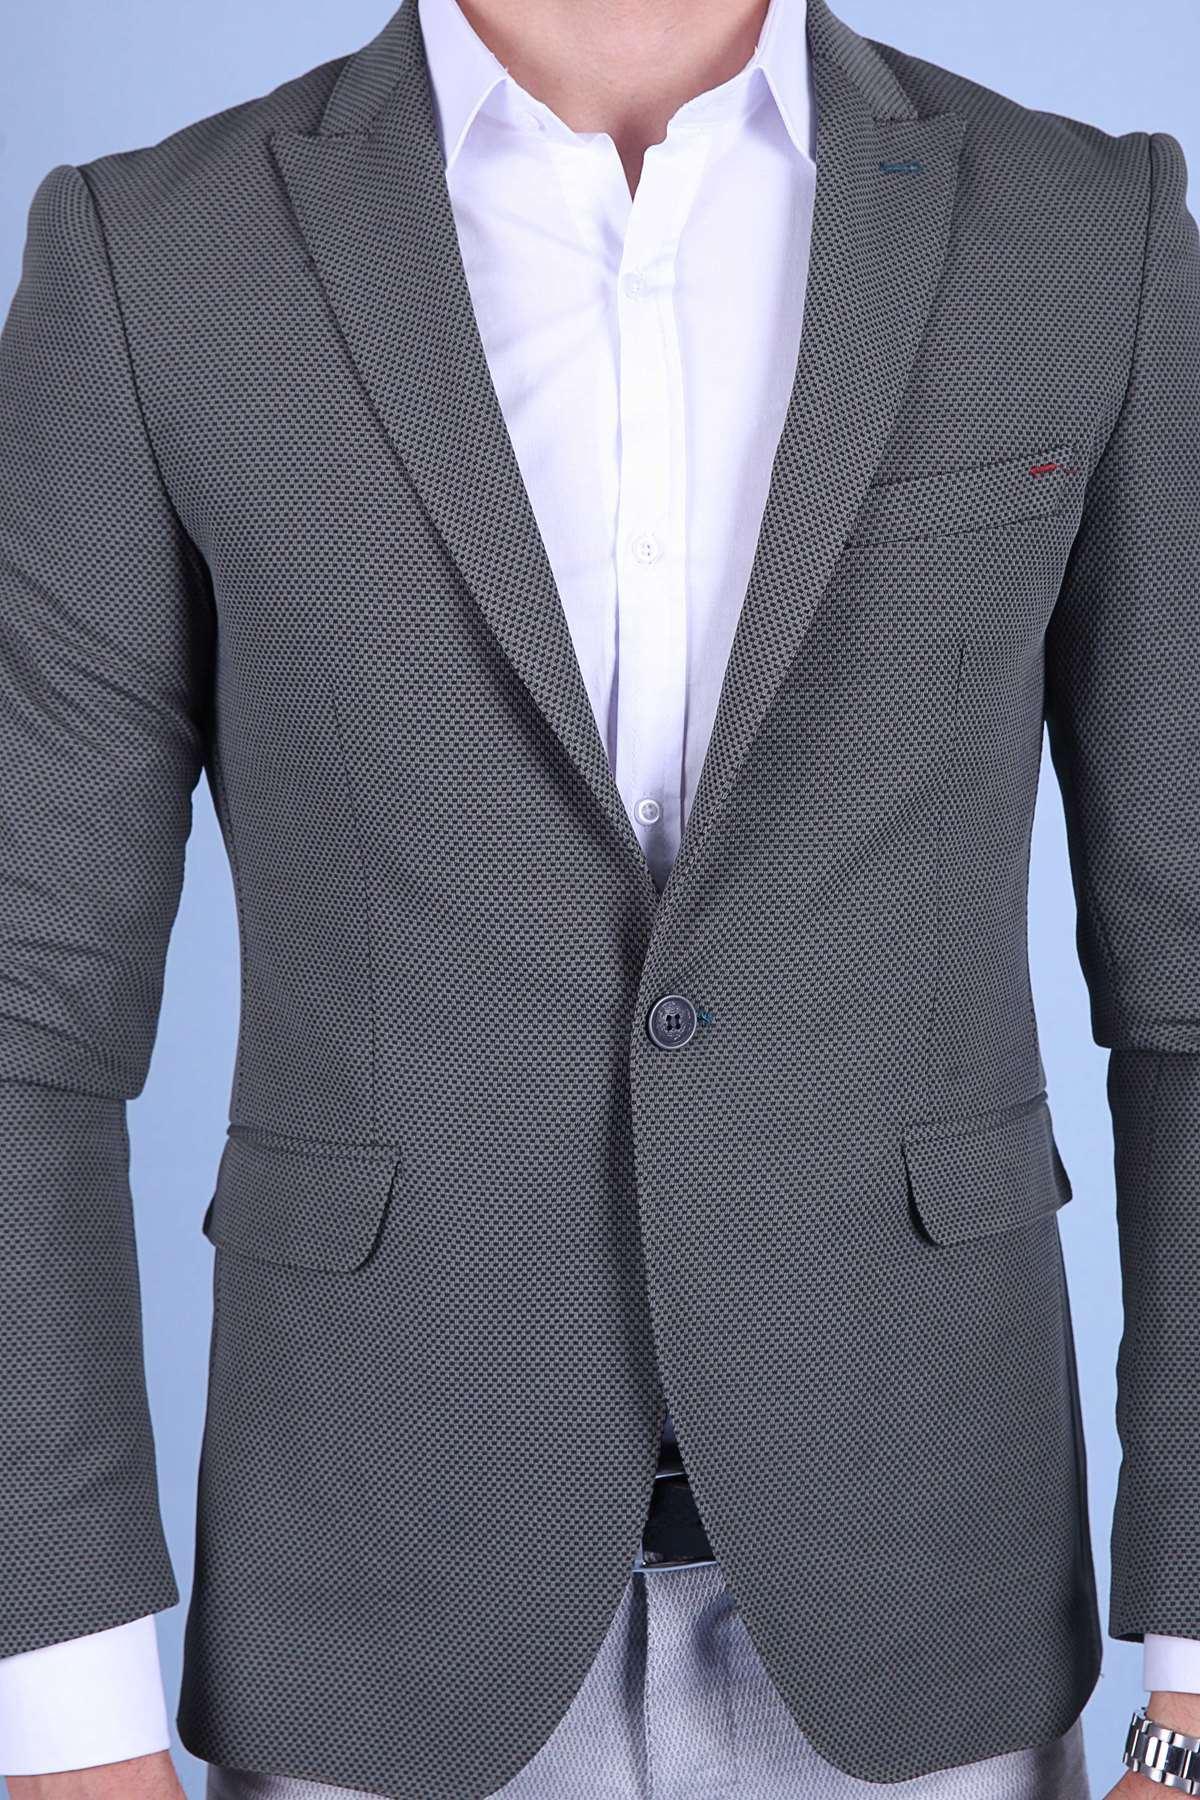 Küçük Kare Desenli Slim Fit Blazer Ceket Haki